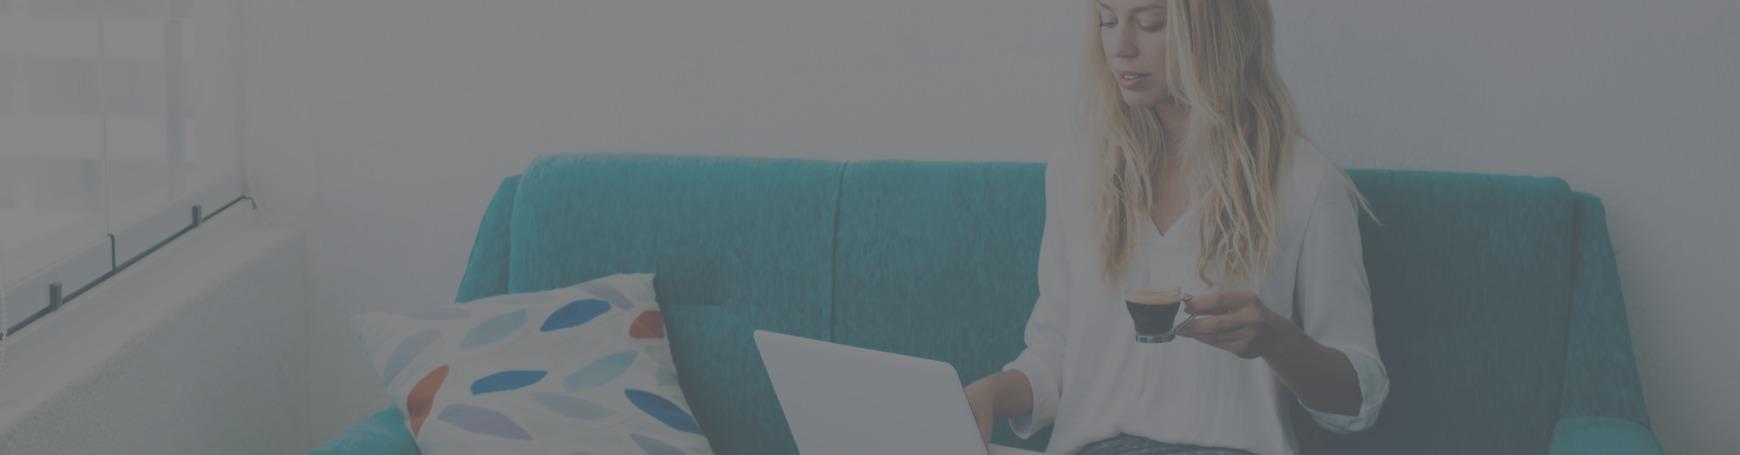 Work_Anywhere_Checklist